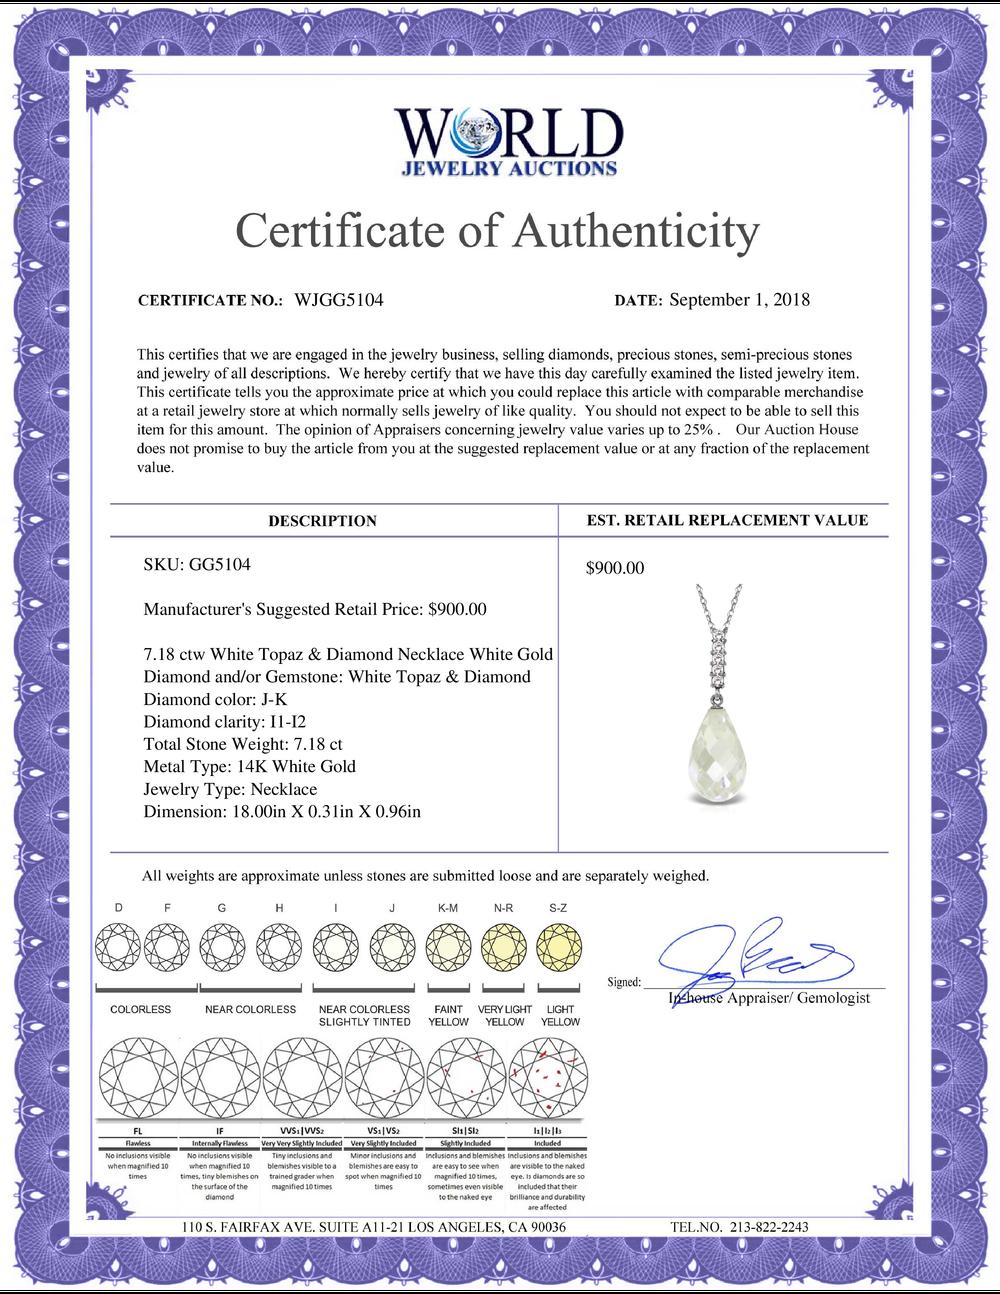 Lot 3037: Genuine 7.18 ctw White Topaz & Diamond Necklace Jewelry 14KT White Gold - REF-29K2V